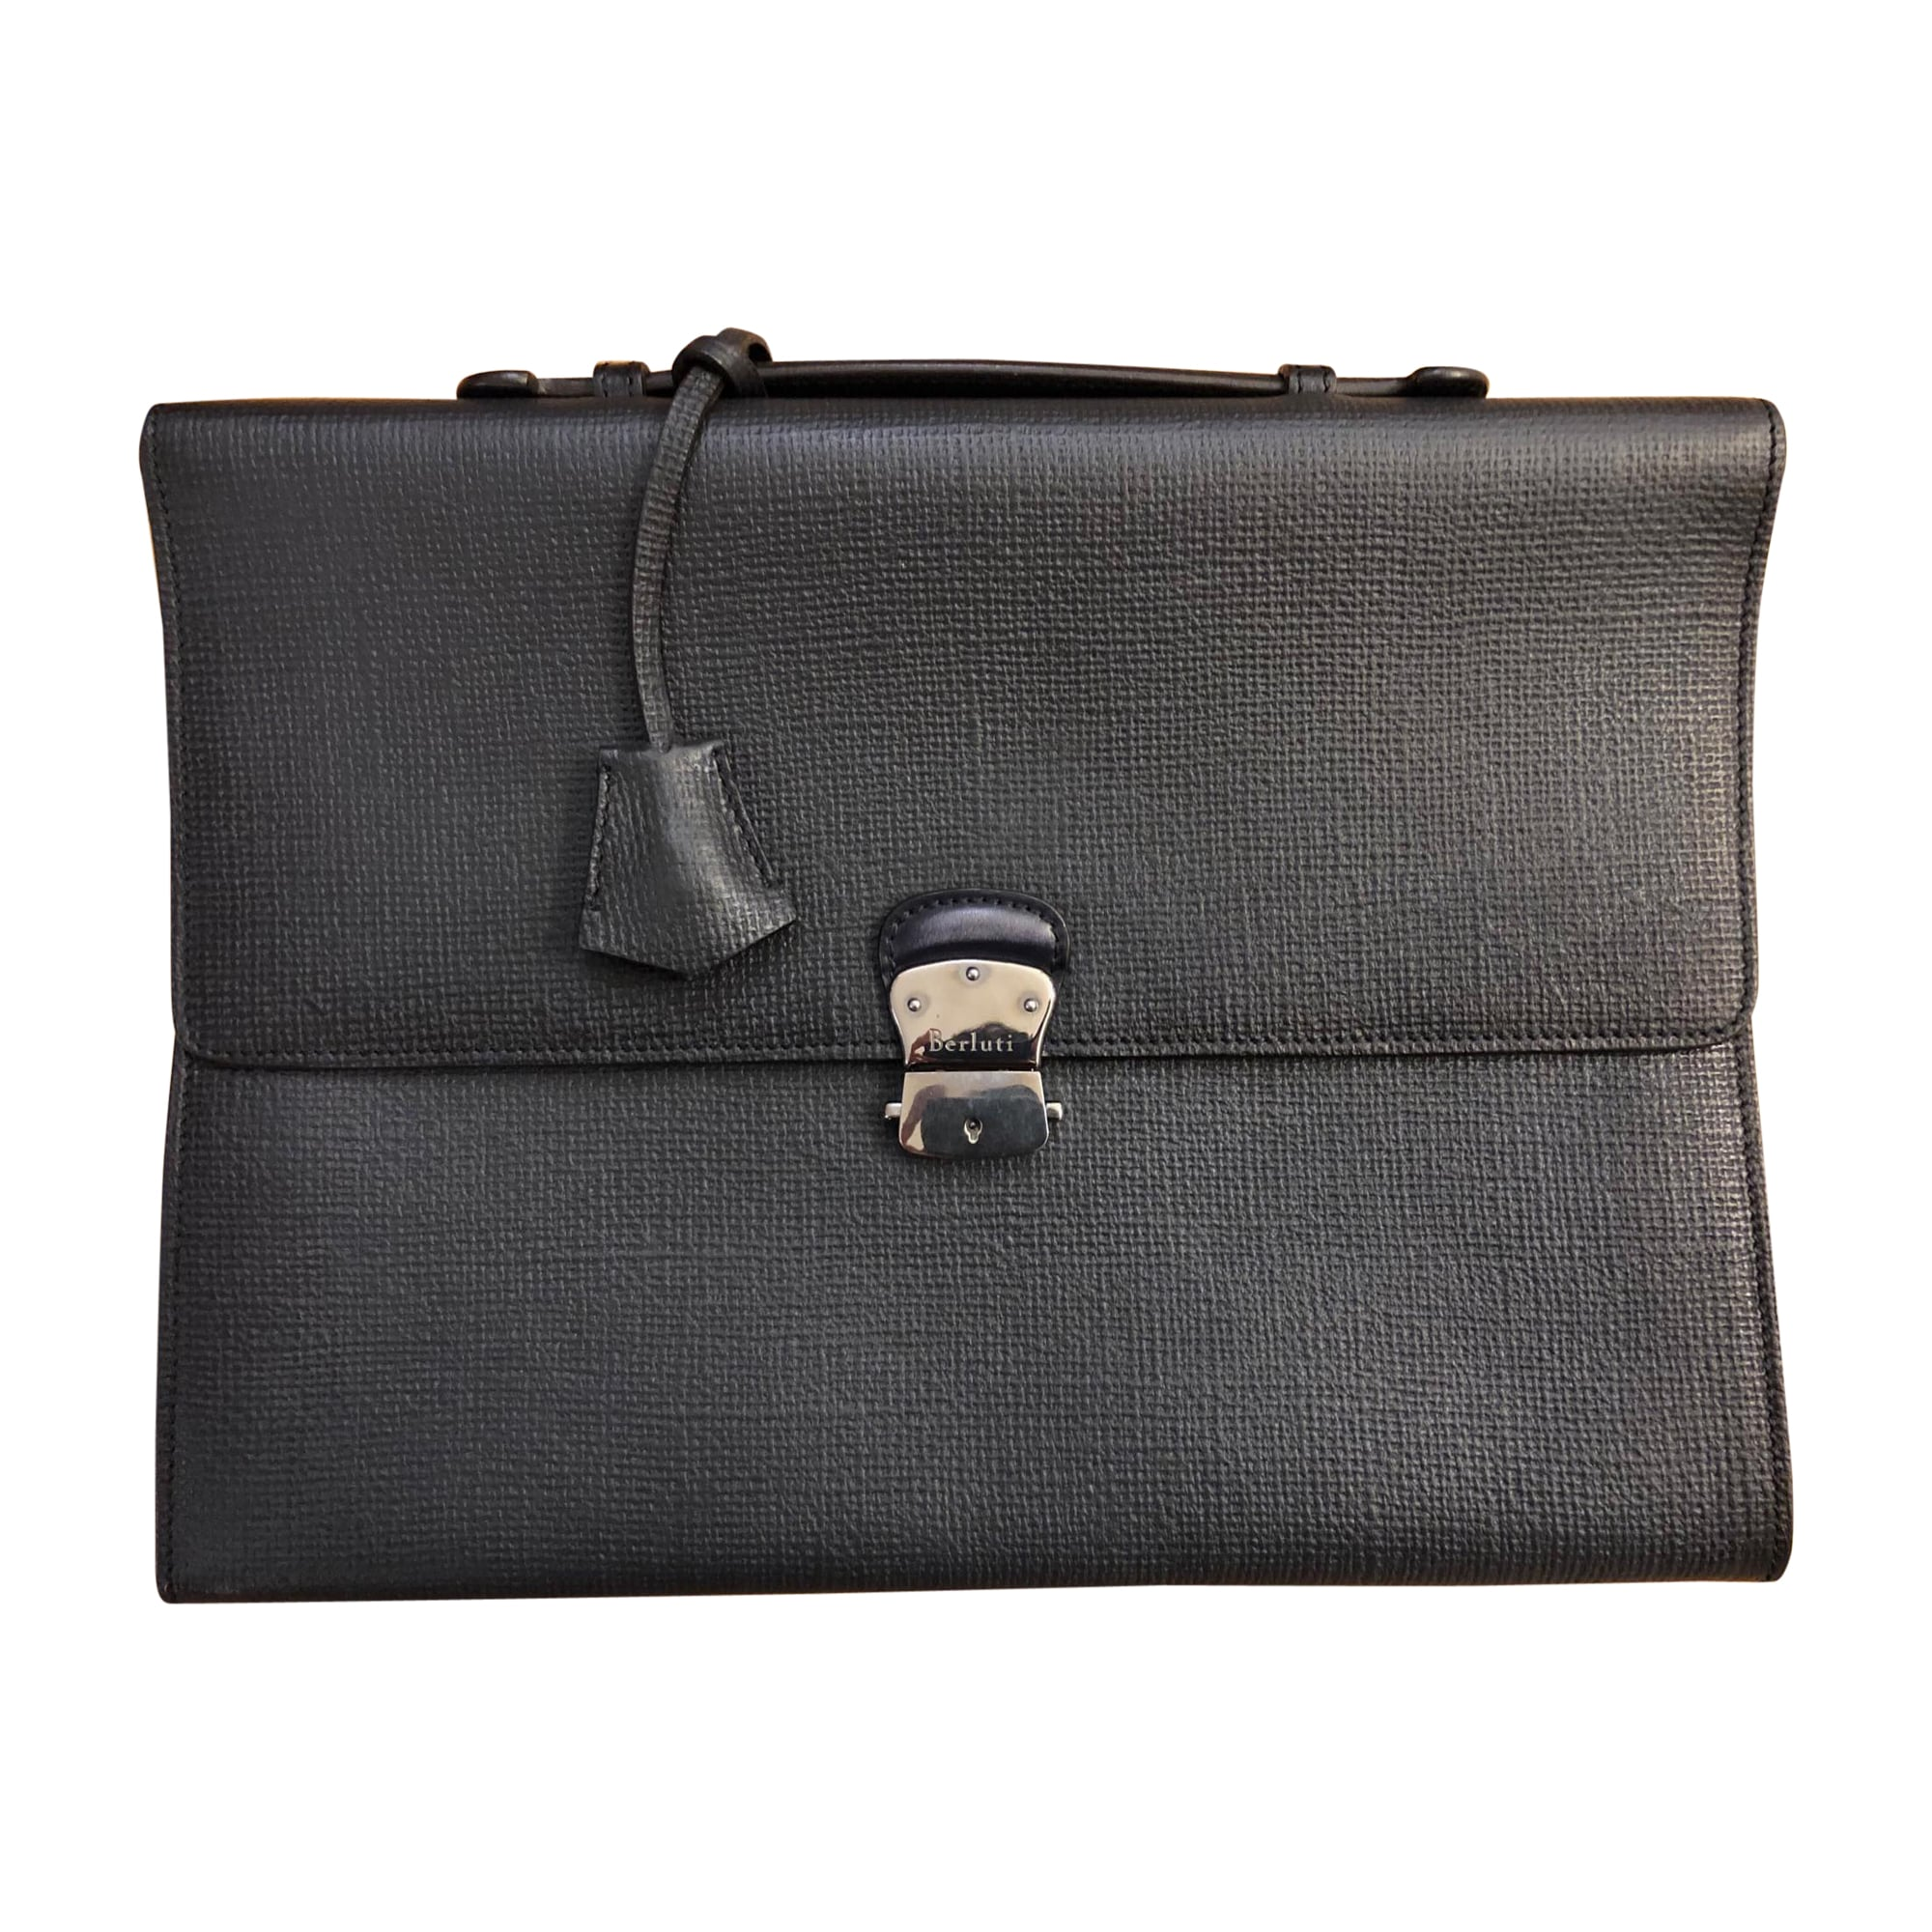 Porte document, serviette BERLUTI cuir gris